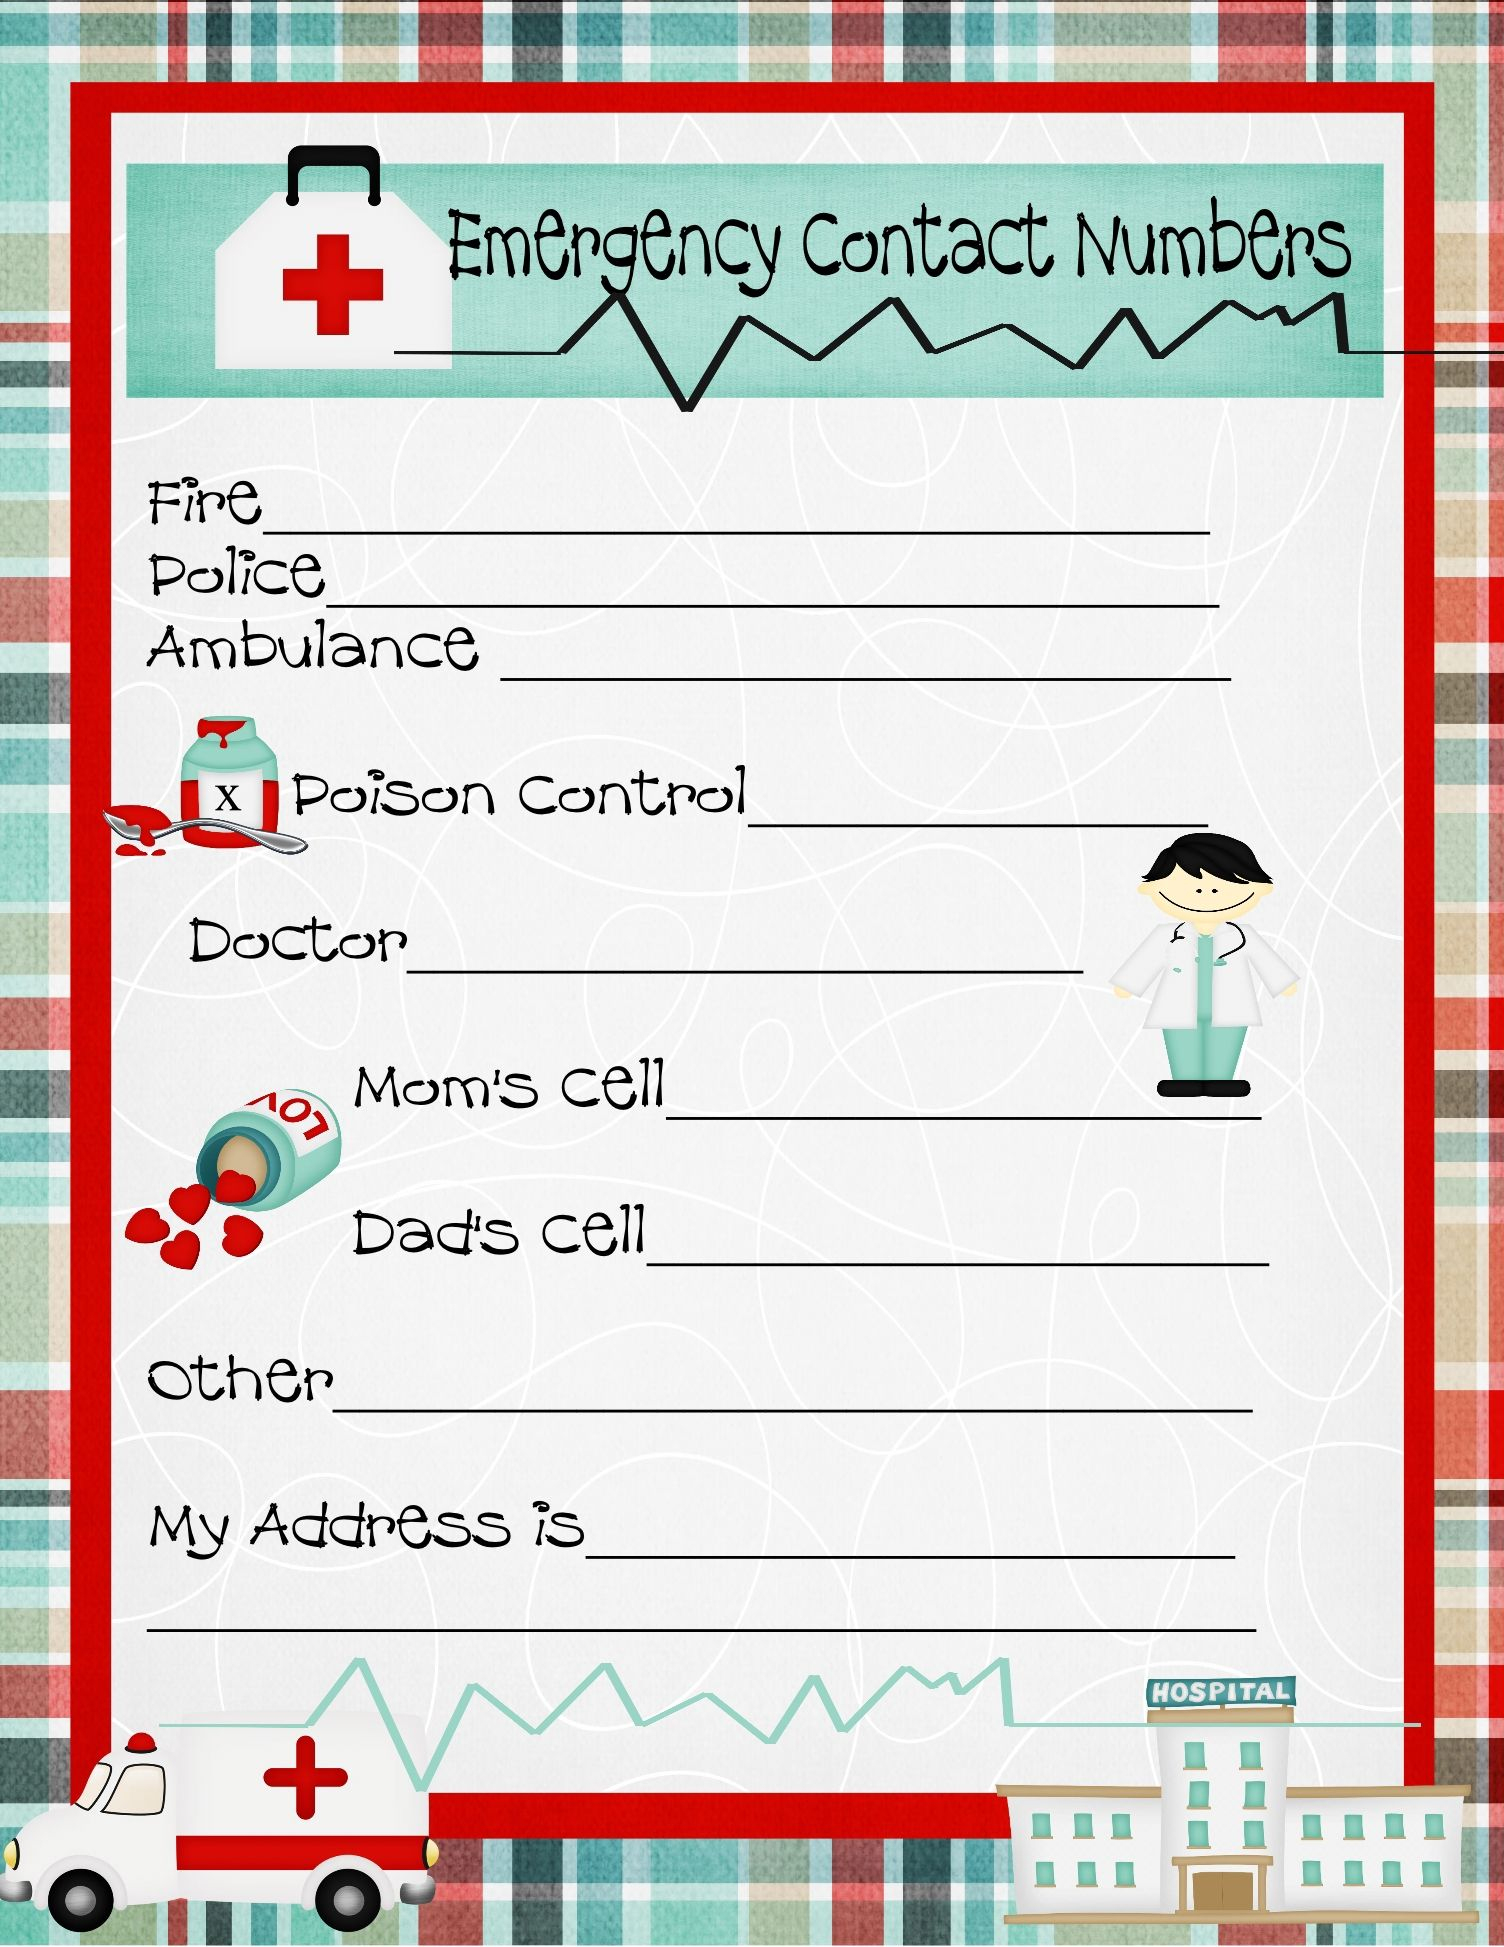 Emergency Numbers Printable   Emergency Contact Phone Numbers And A - Free Printable Emergency Phone List